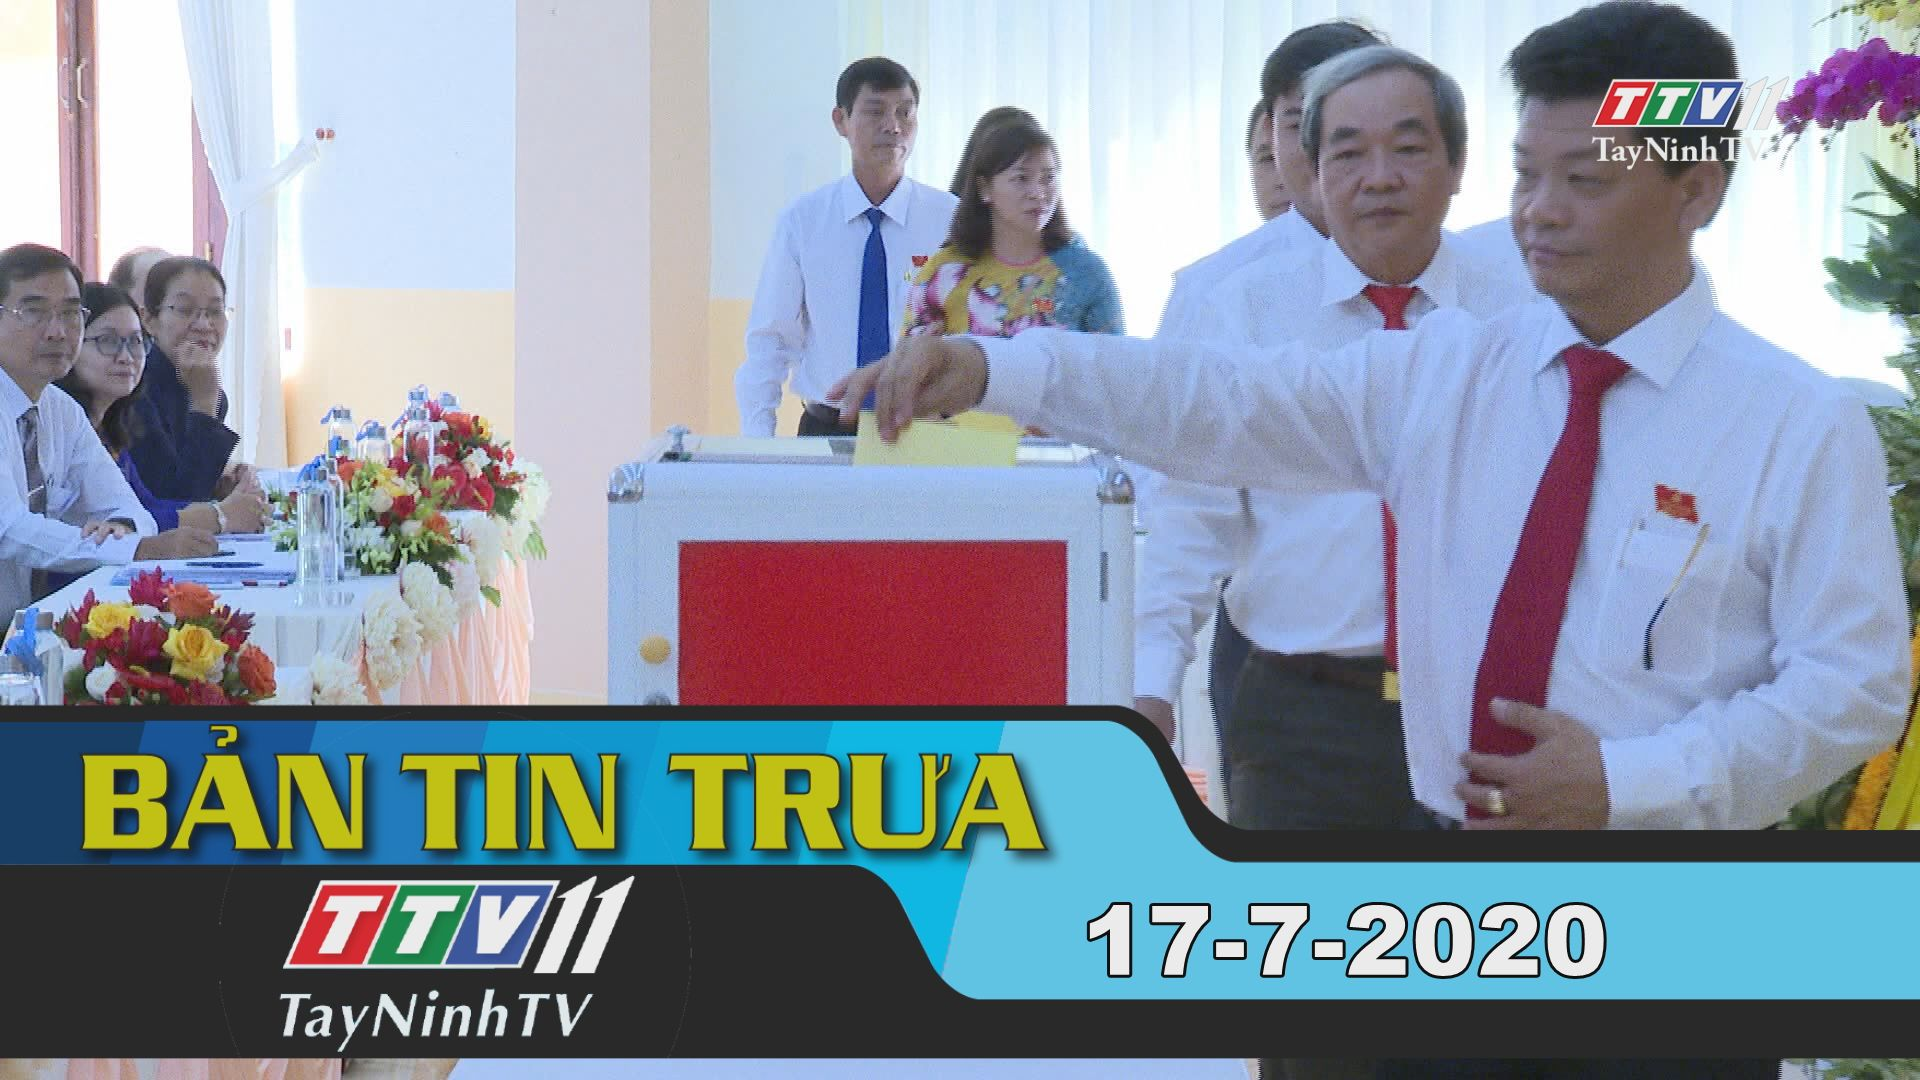 Bản tin trưa 17-7-2020 | Tin tức hôm nay | TayNinhTV